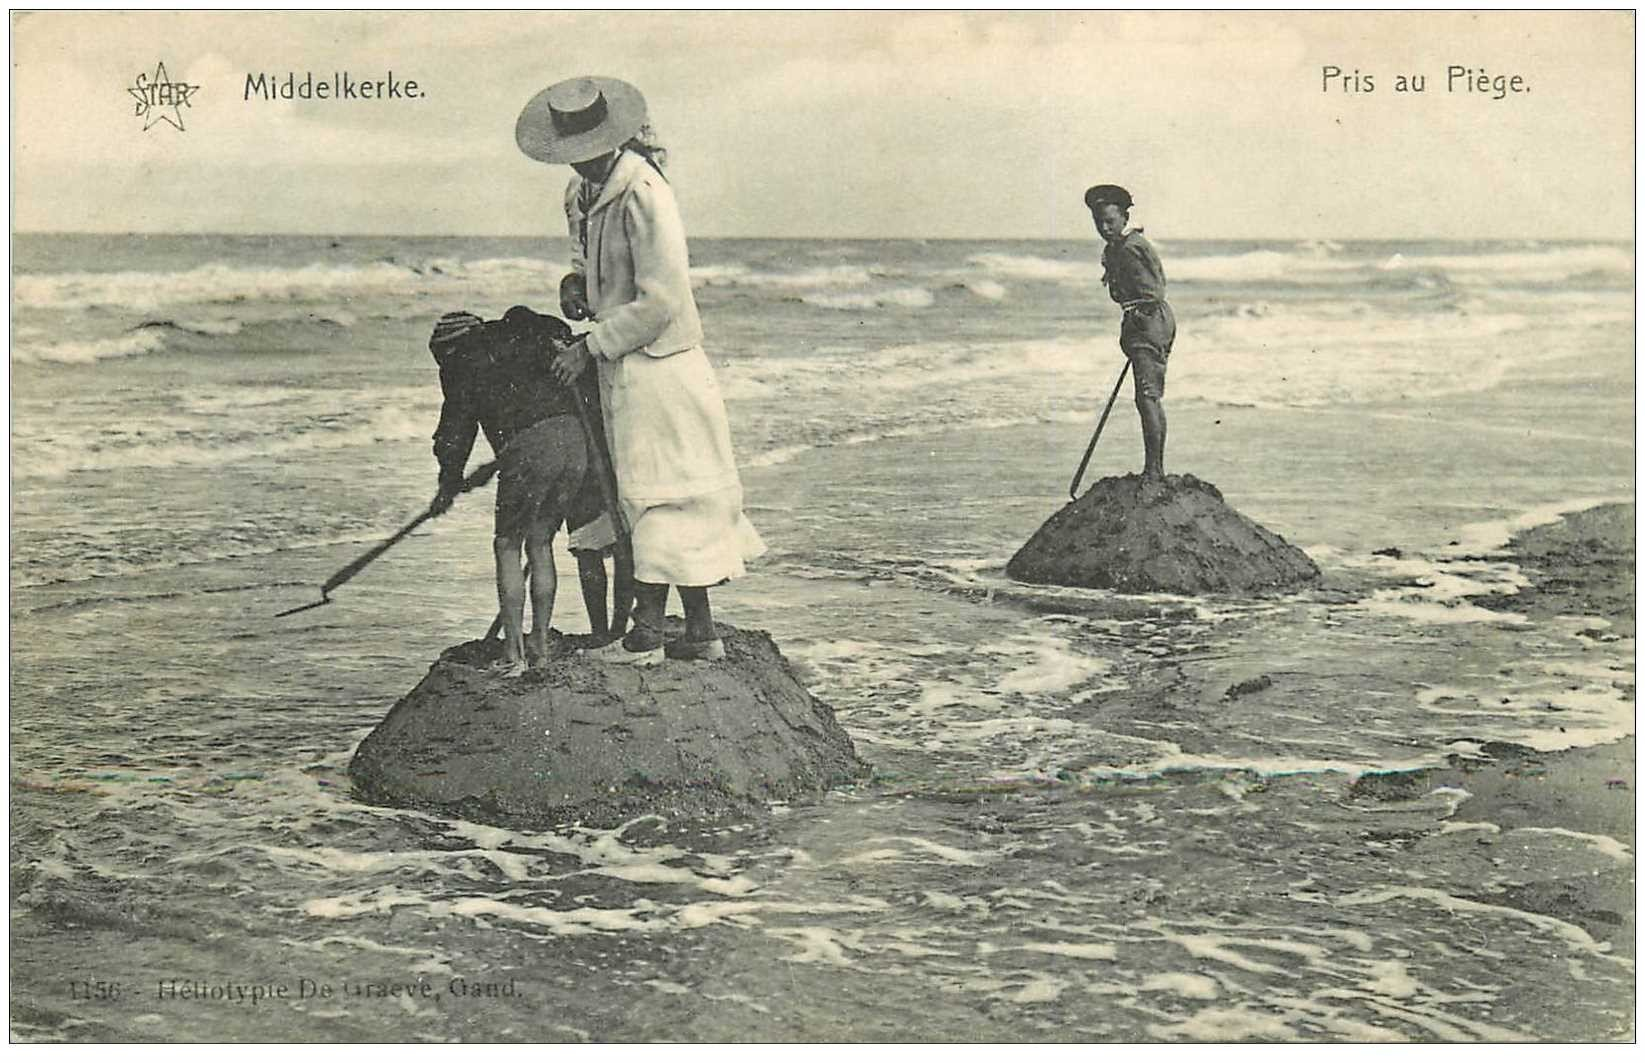 carte postale ancienne MIDDELKERKE. Pris au Piège par la Marée 1909